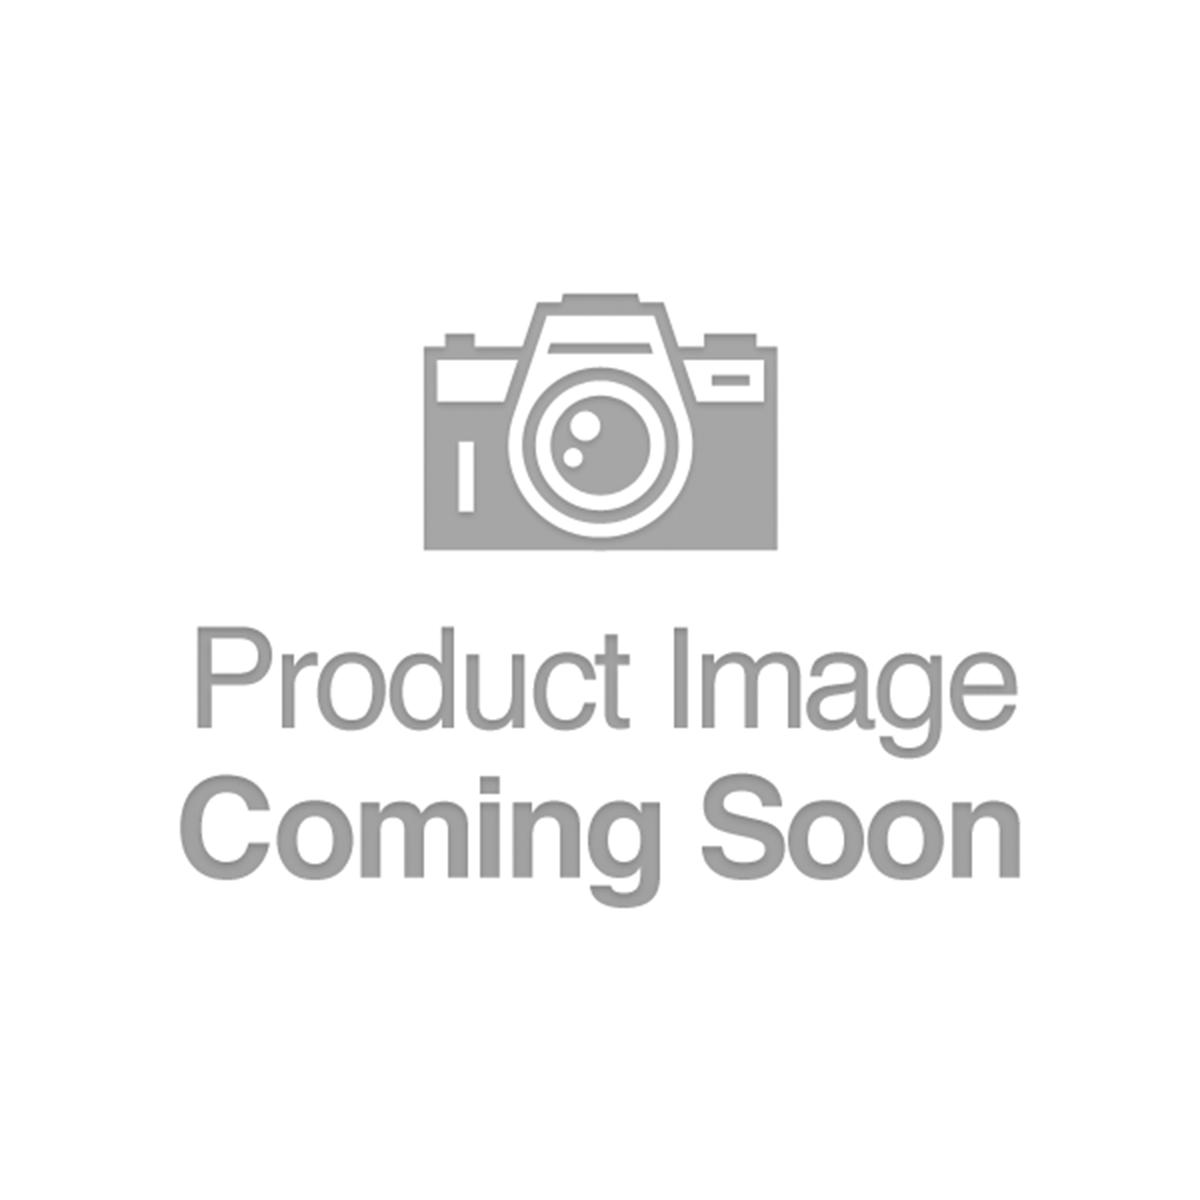 FR 118 $10 1901 Legal Tender PMG 25